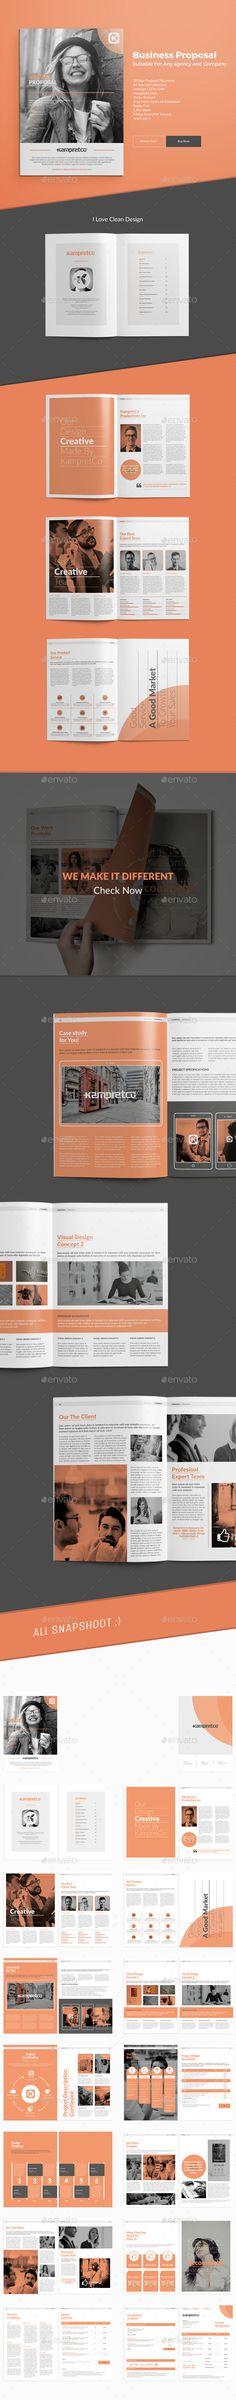 Proposal Design Tempalte Download: http://graphicriver.net/item/proposal/12931976?ref=ksioks